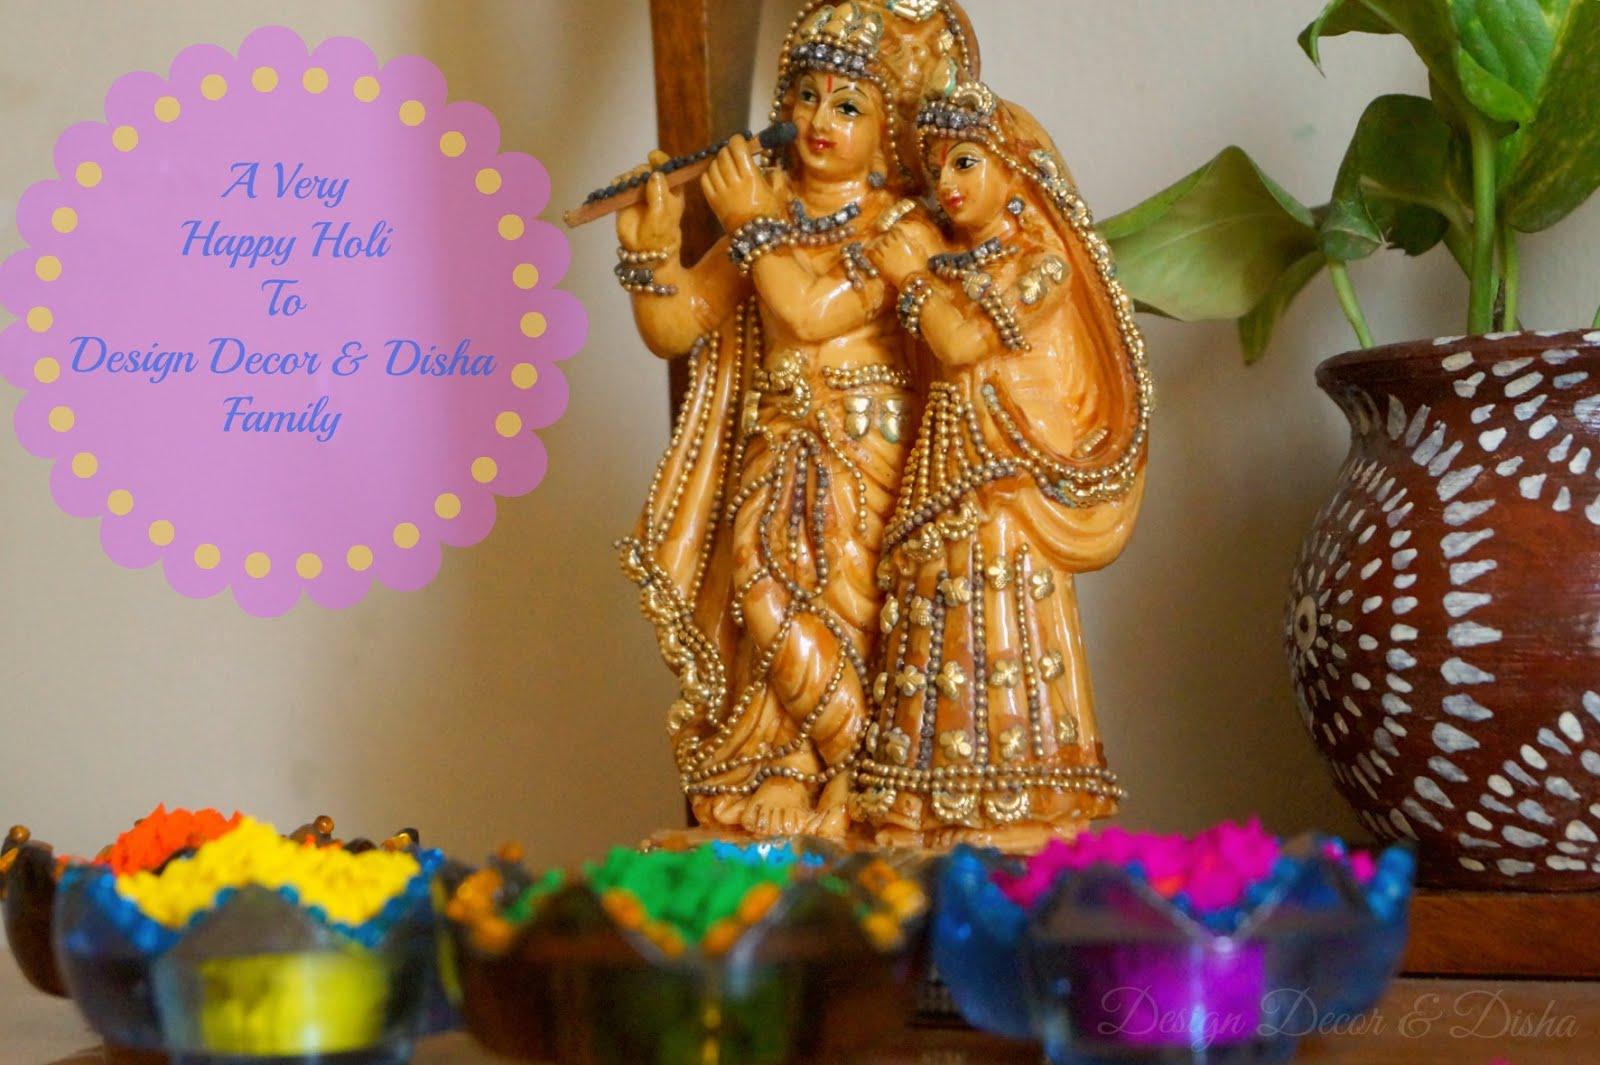 Design decor disha happy holi for Holi decorations at home